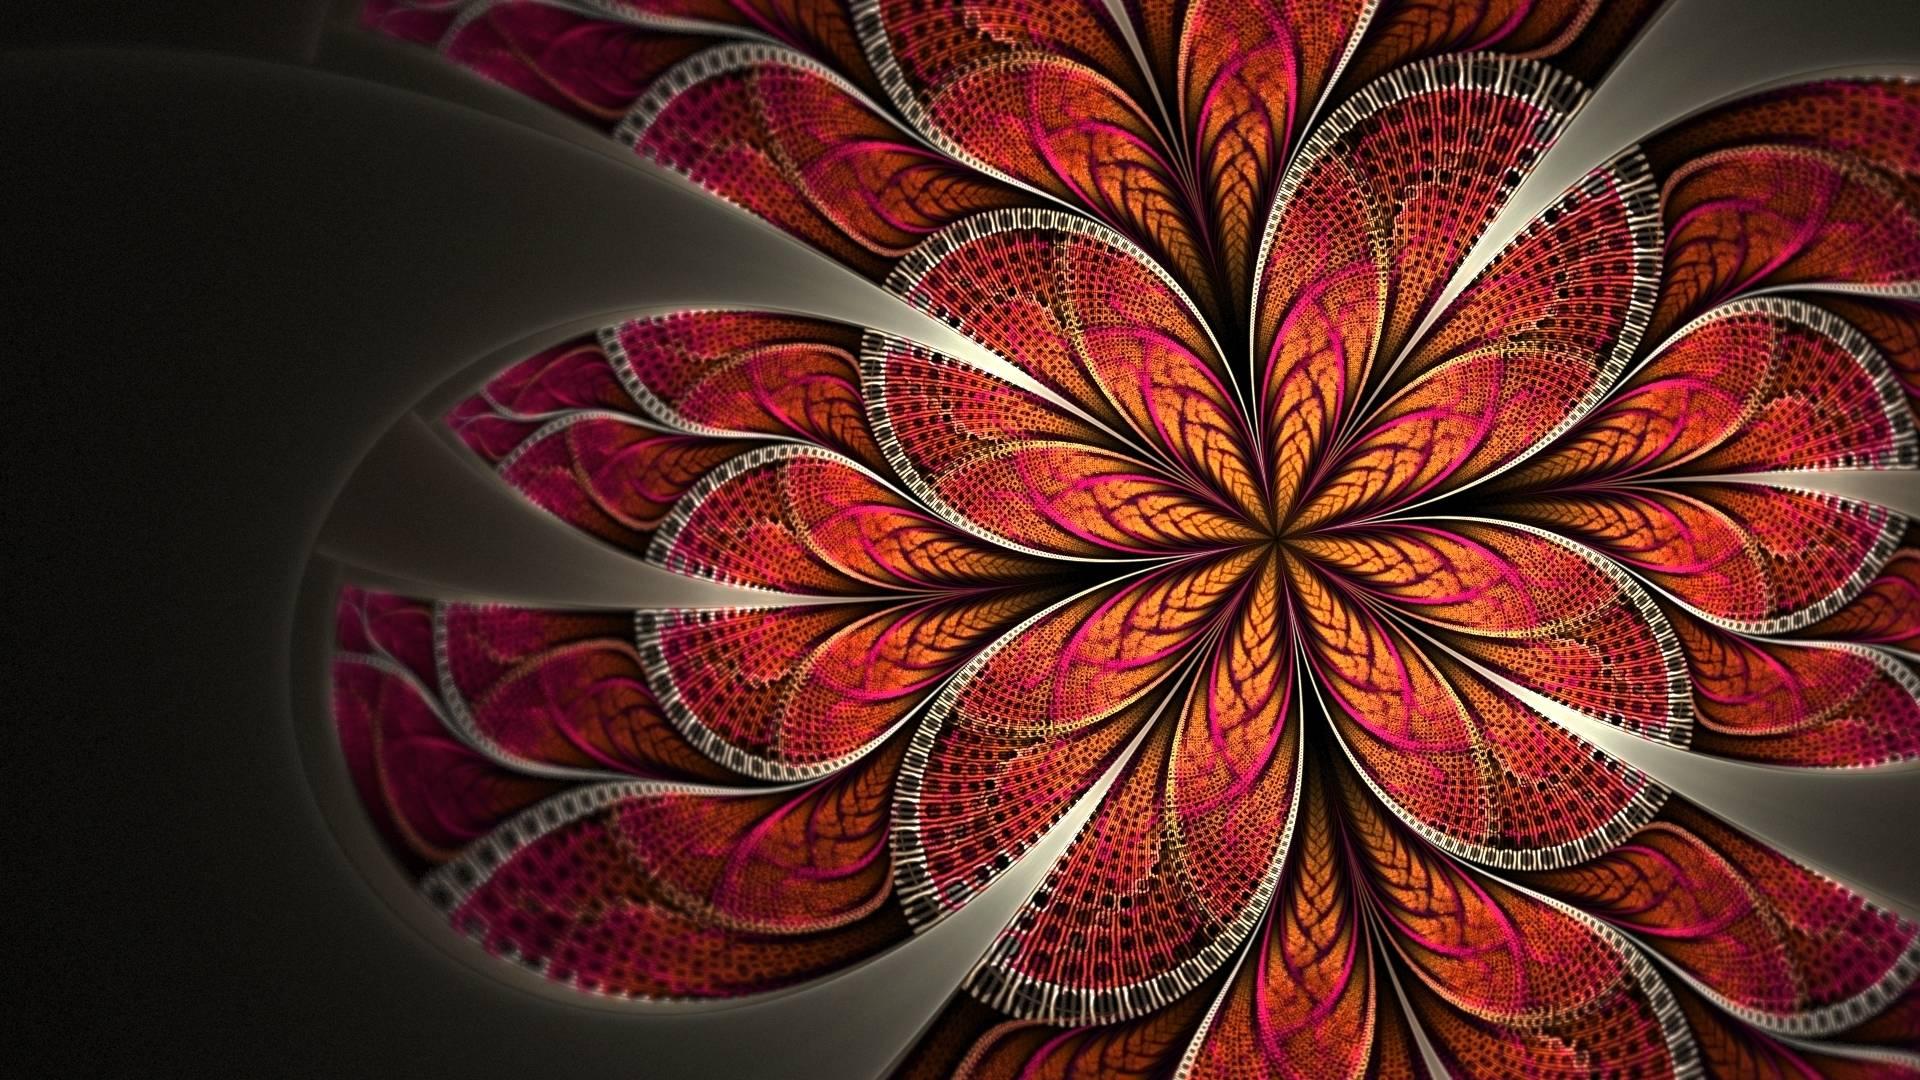 Abstract Desktop Wallpapers Wallpaper Cave